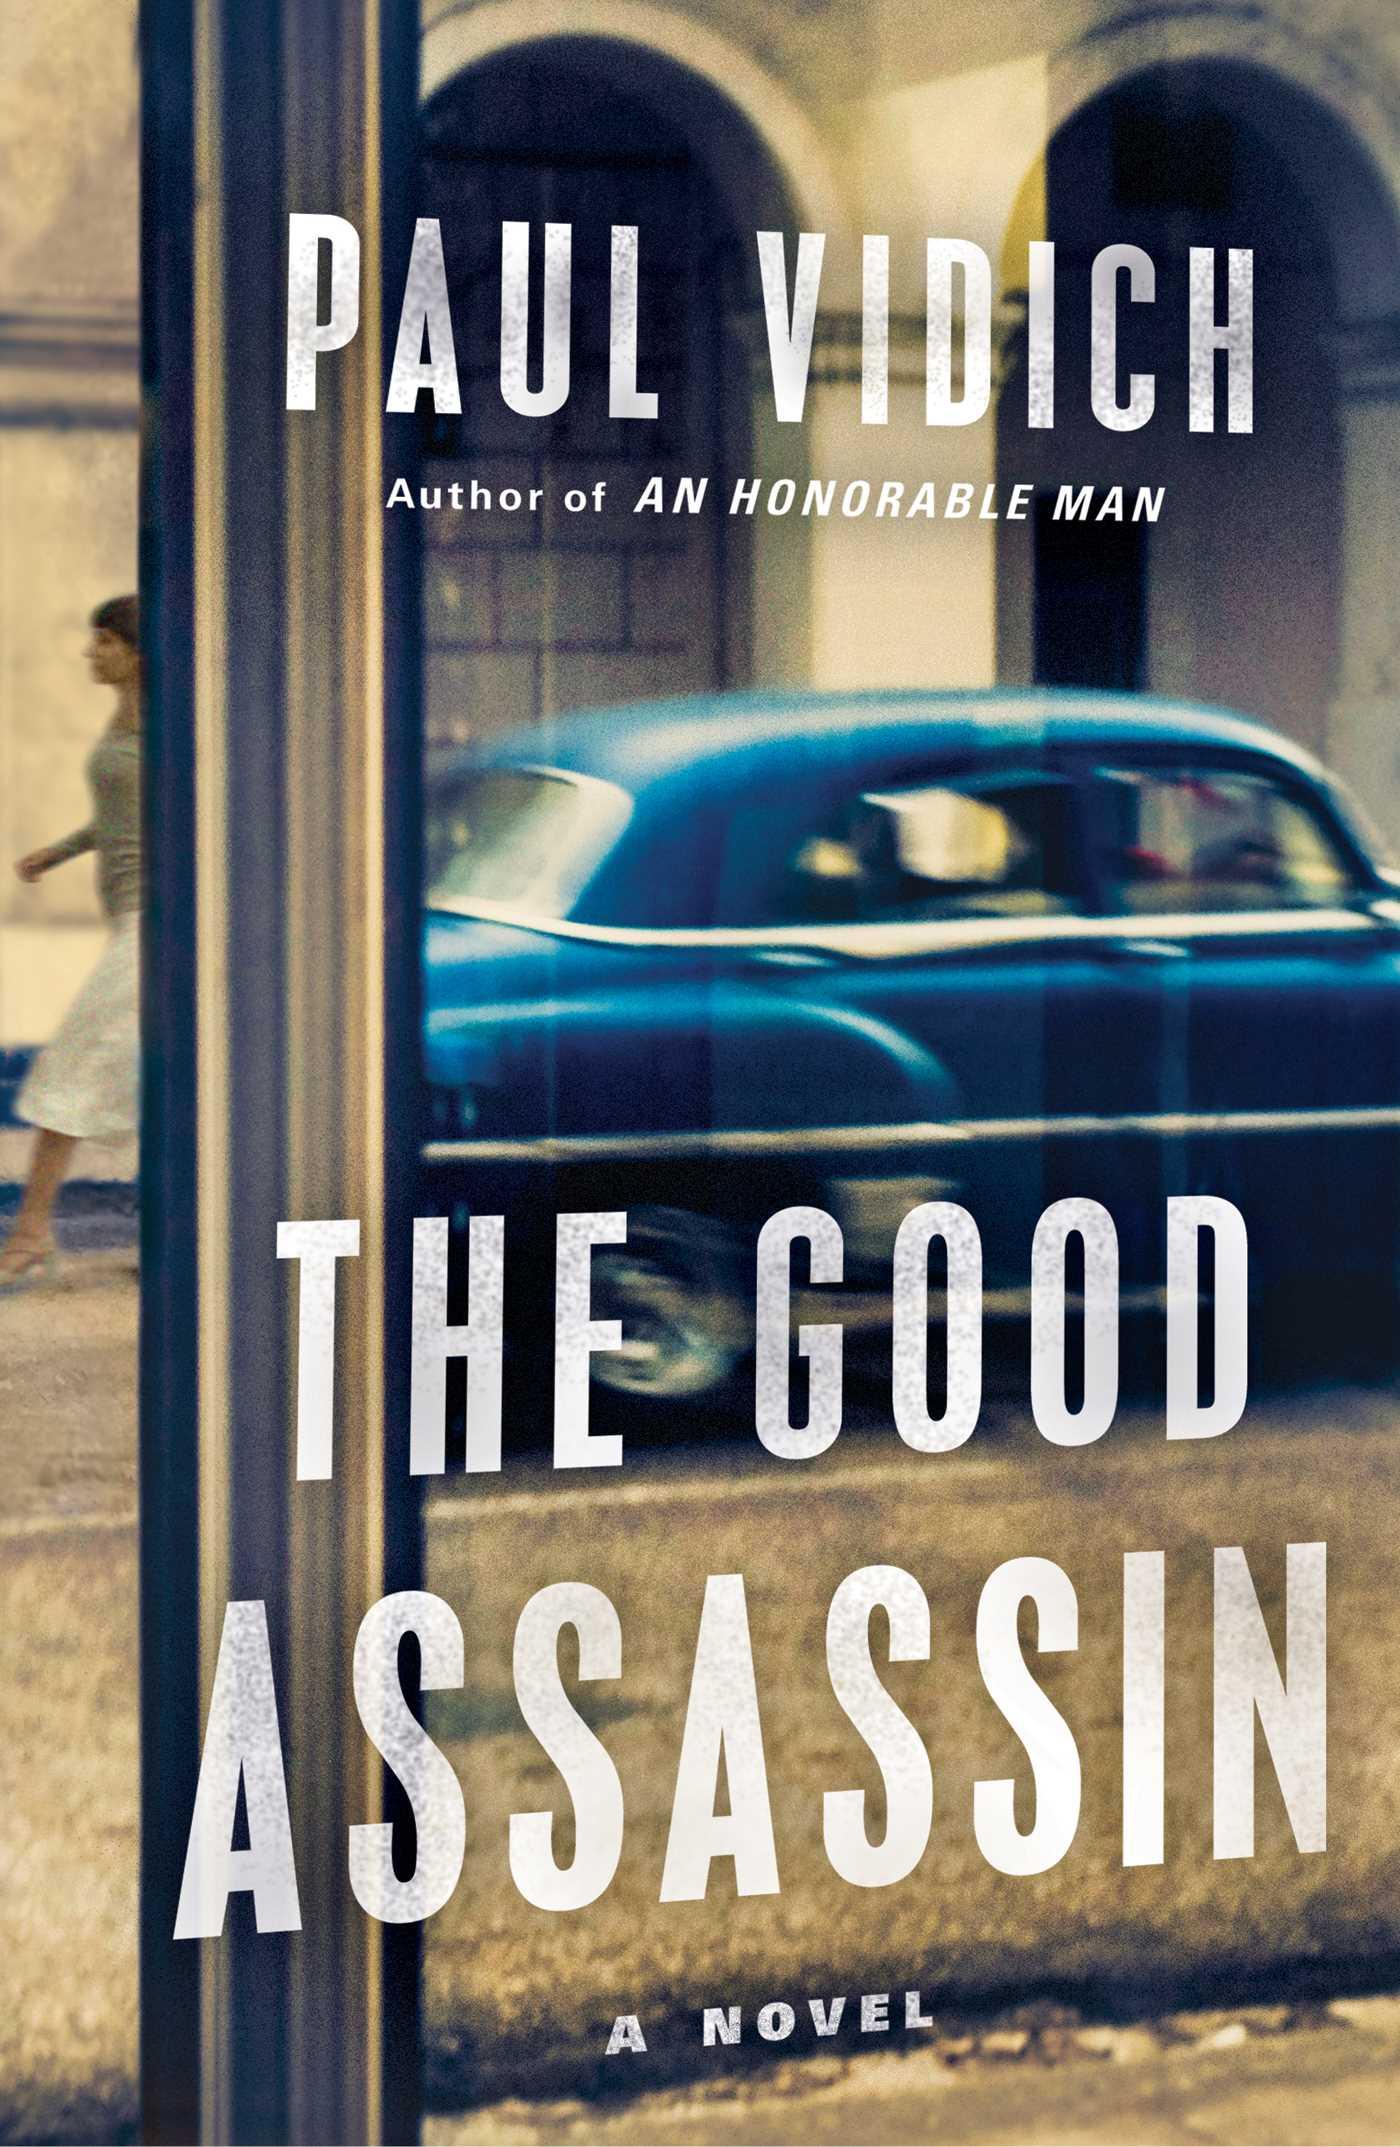 The good assassin 9781501110429 hr